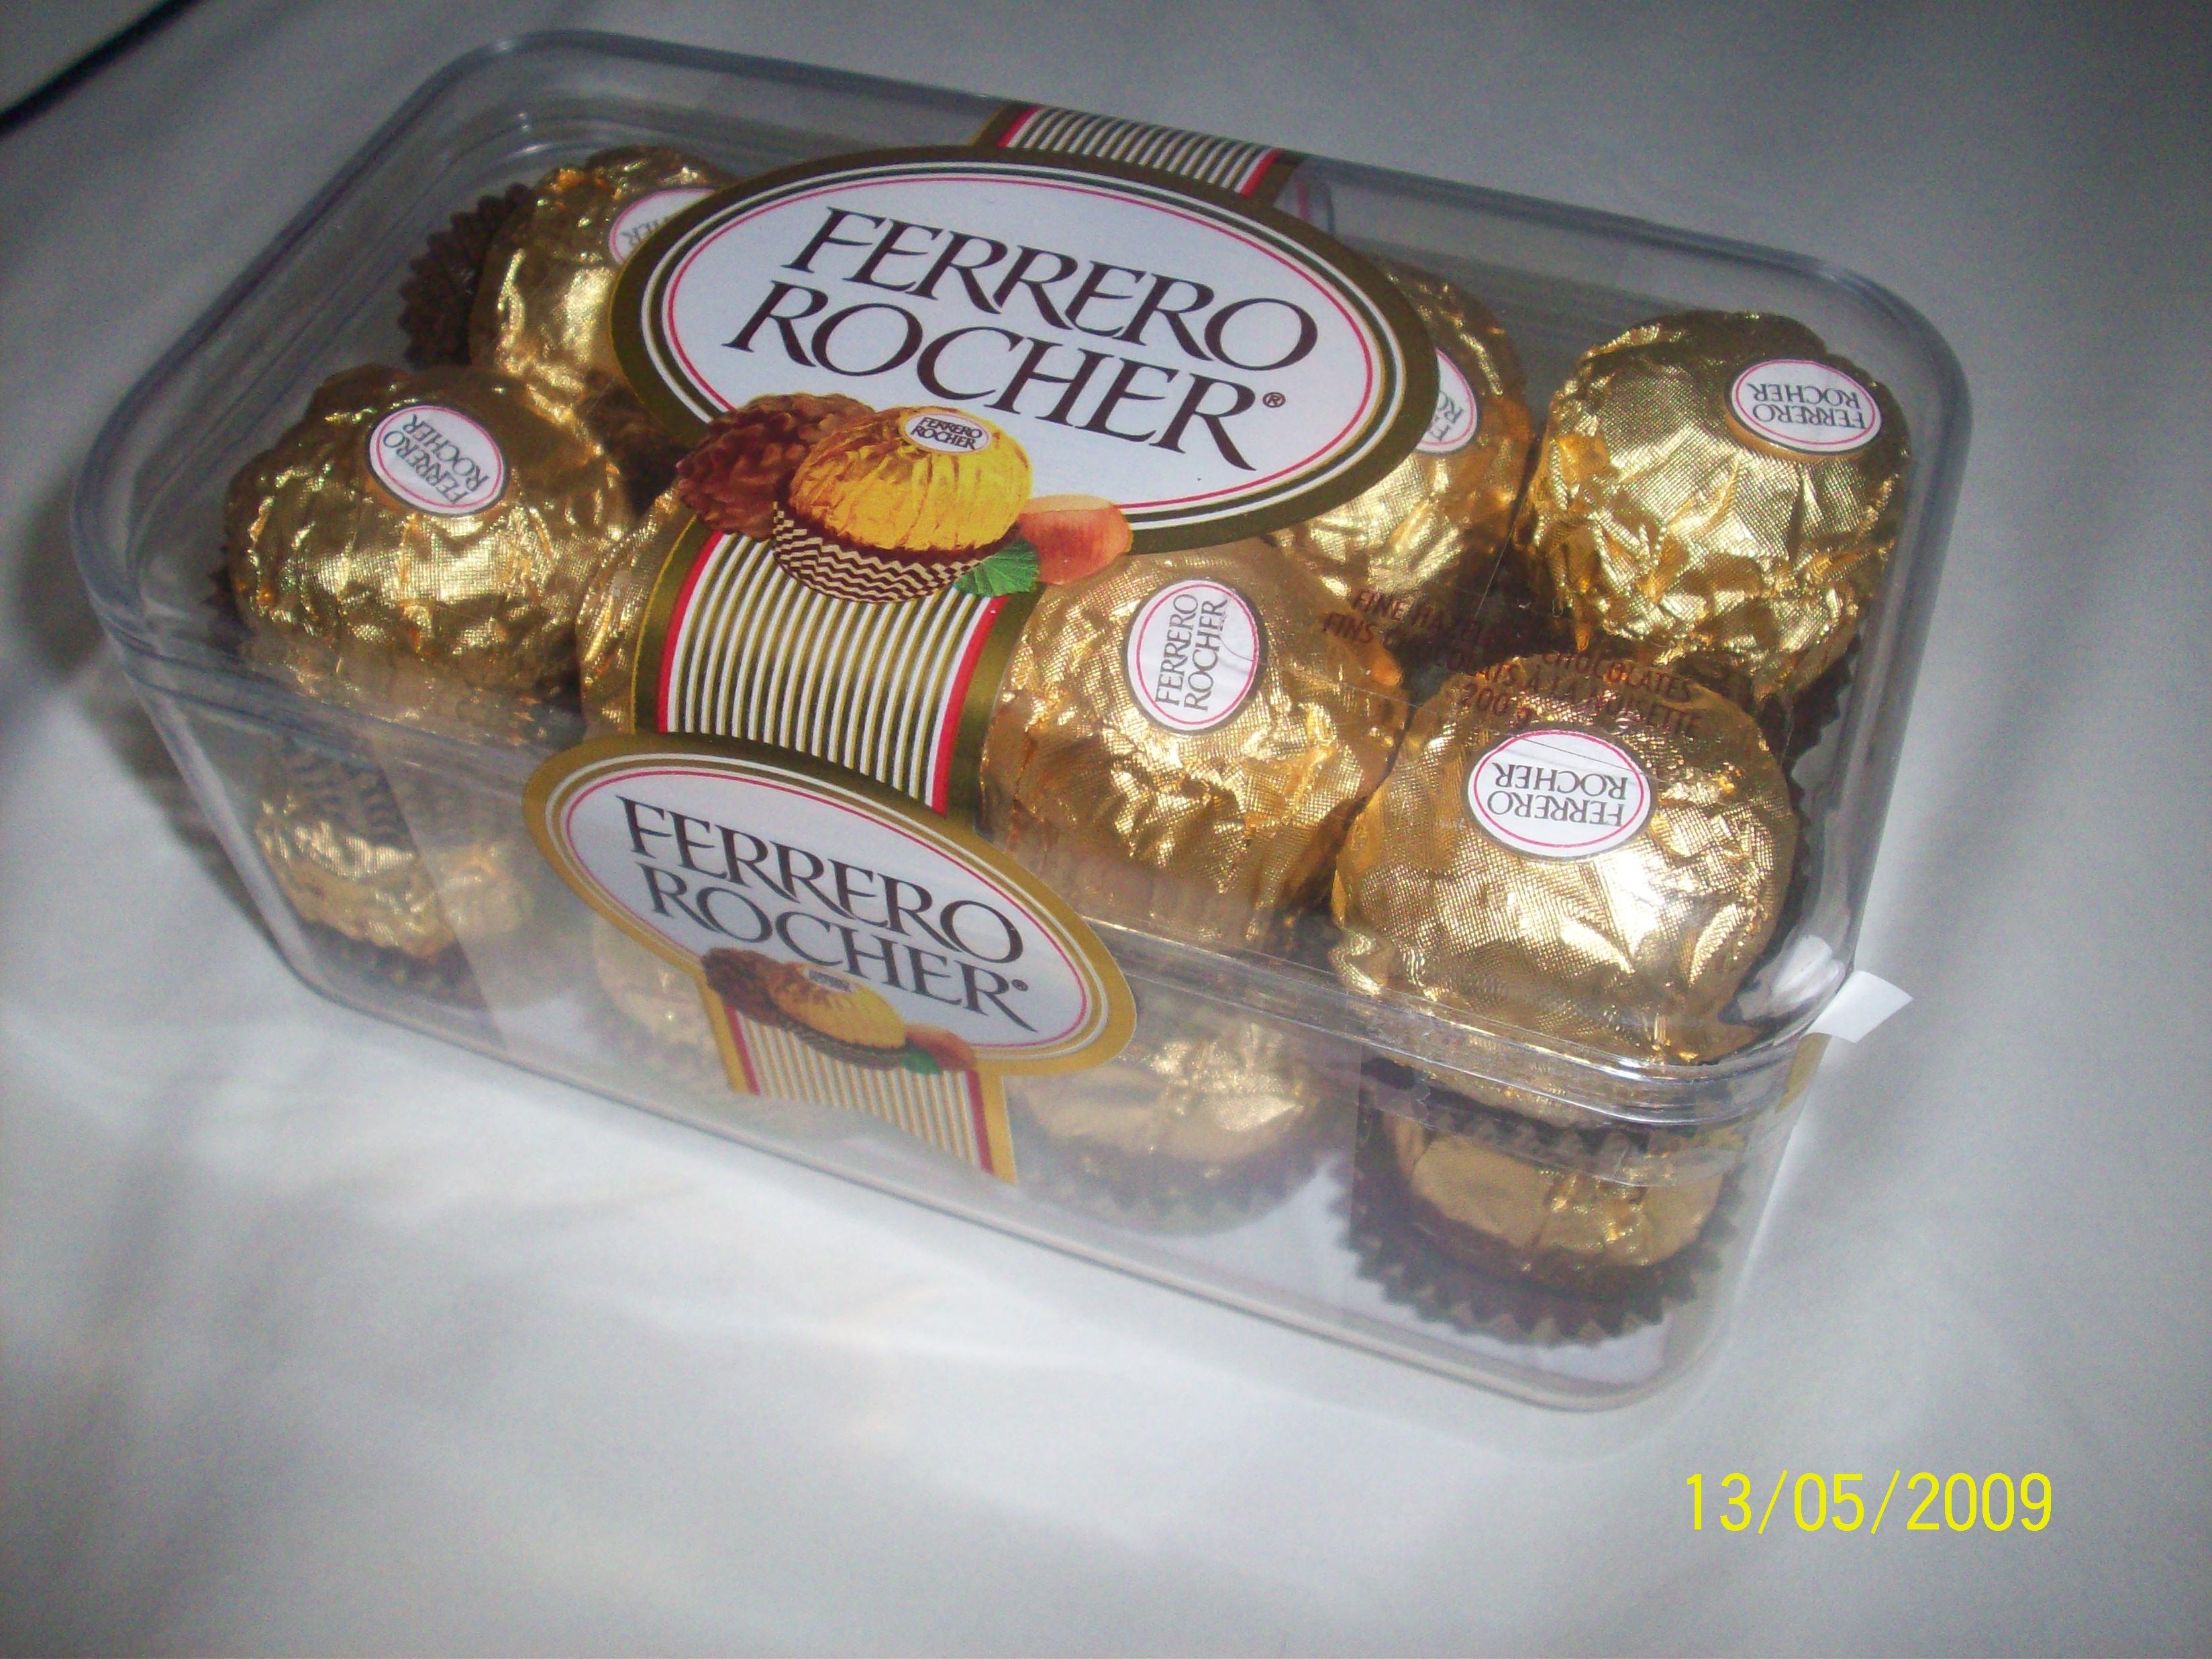 https://foodloader.net/cutie_2009-05-13_Chocolates.jpg